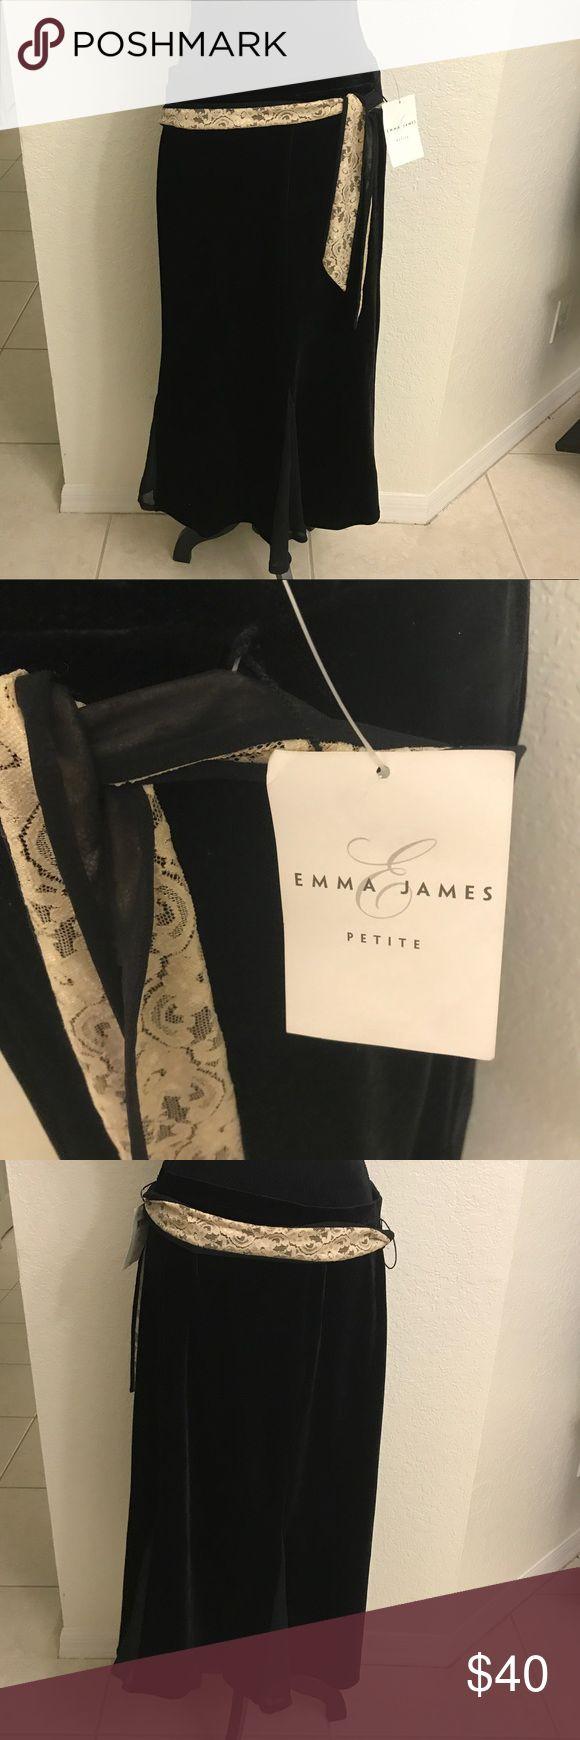 Emma James Petite Black w/ Lace Belt Skirt Size XL NWT Emma James Petite Black Skirt with cream colored lace belt size XL. Emma James Skirts